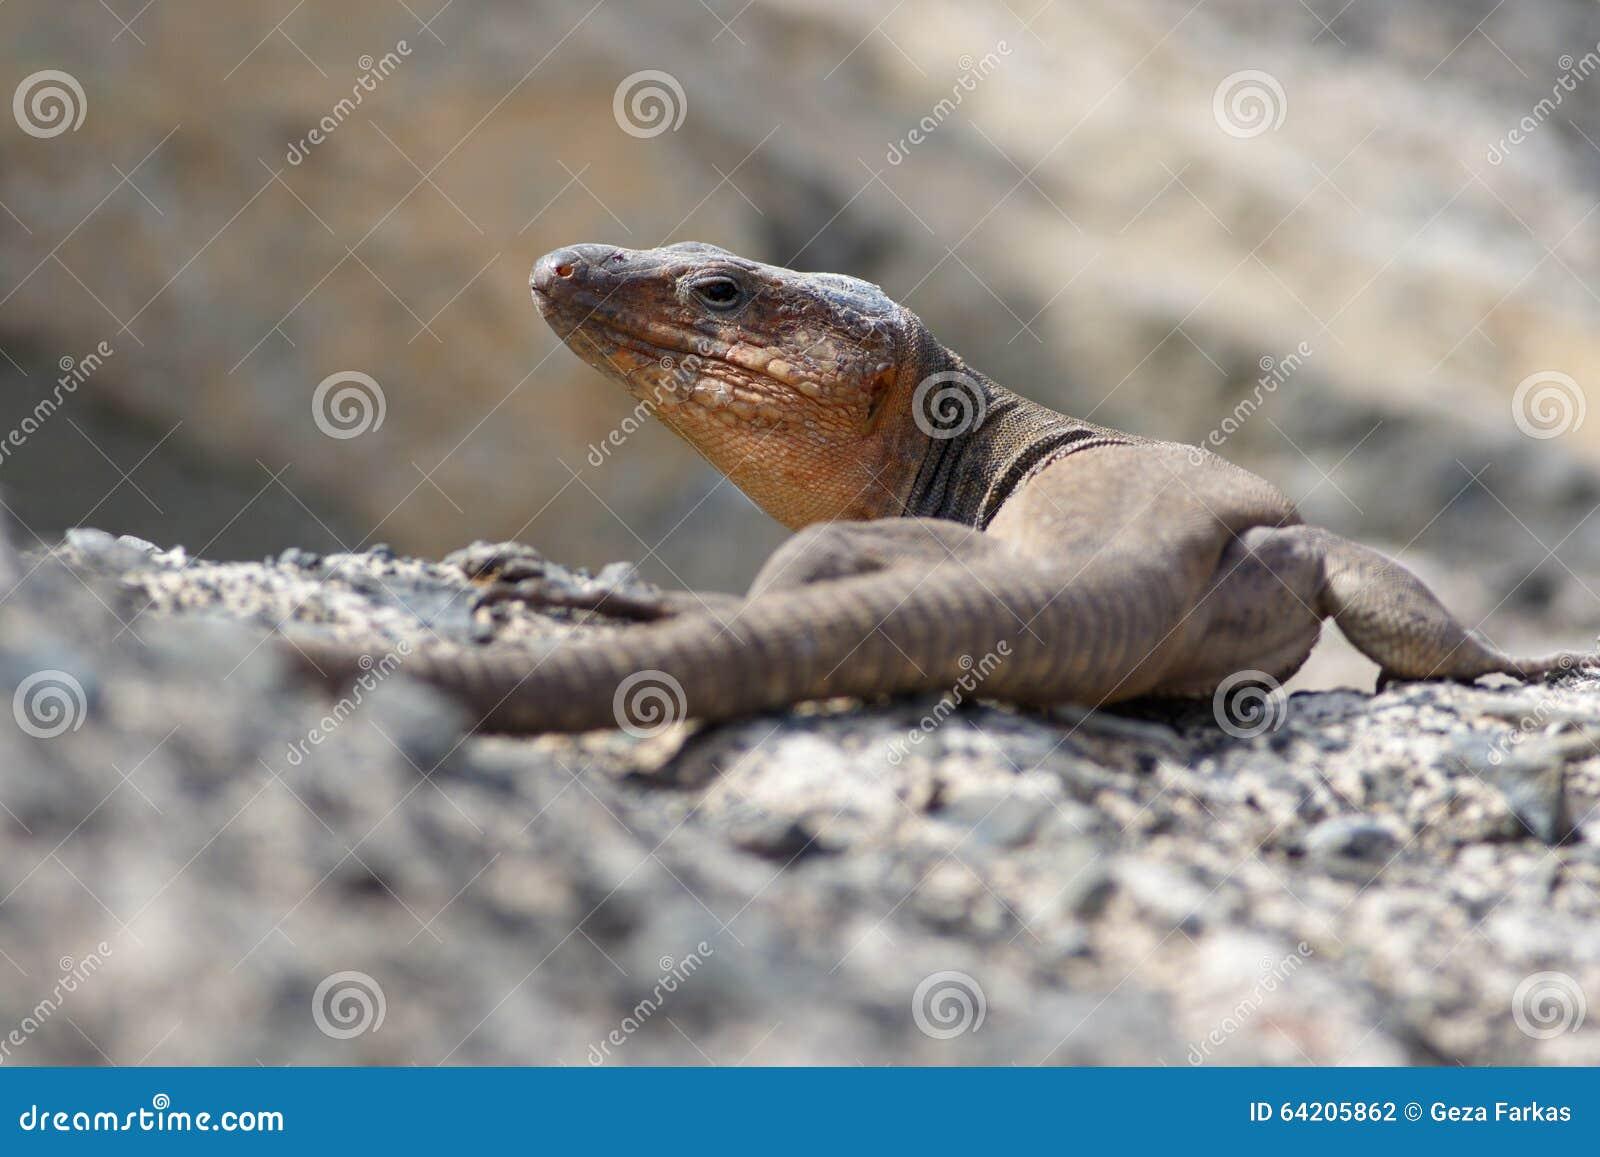 El endemic grande del lagarto gigante de Gran Canaria protegió speci del reptil